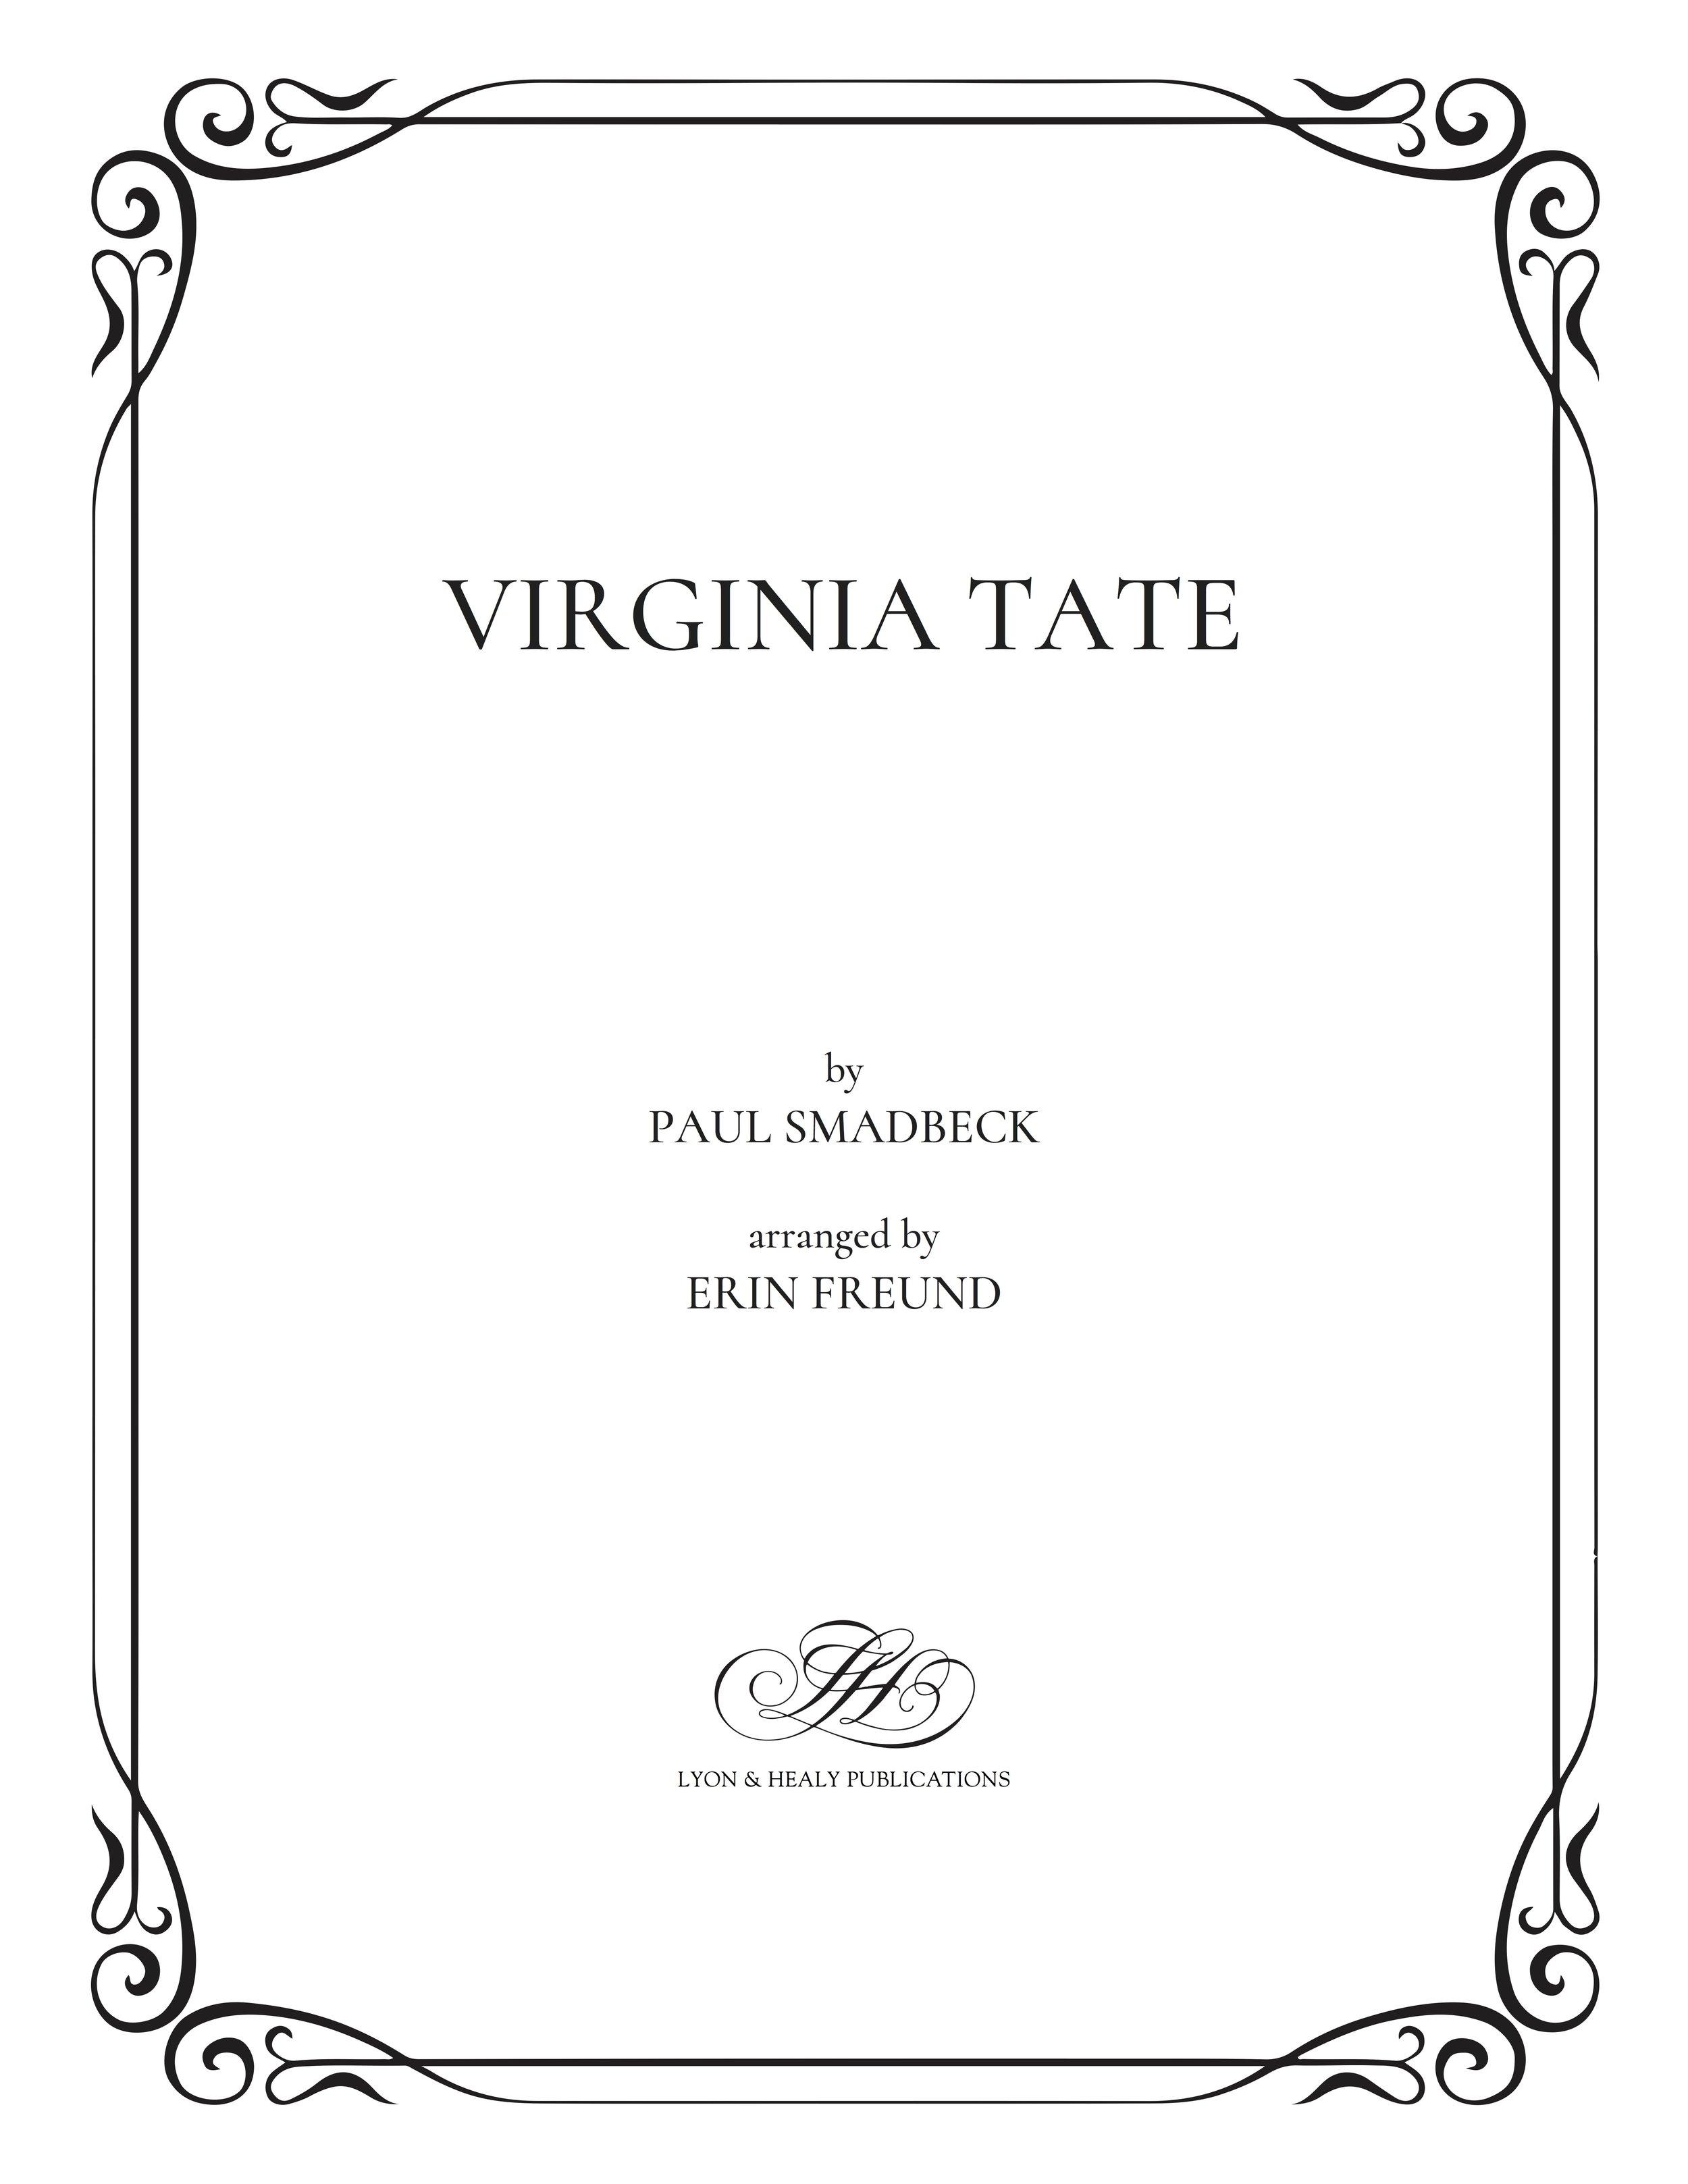 Virginia Tate cover.jpg